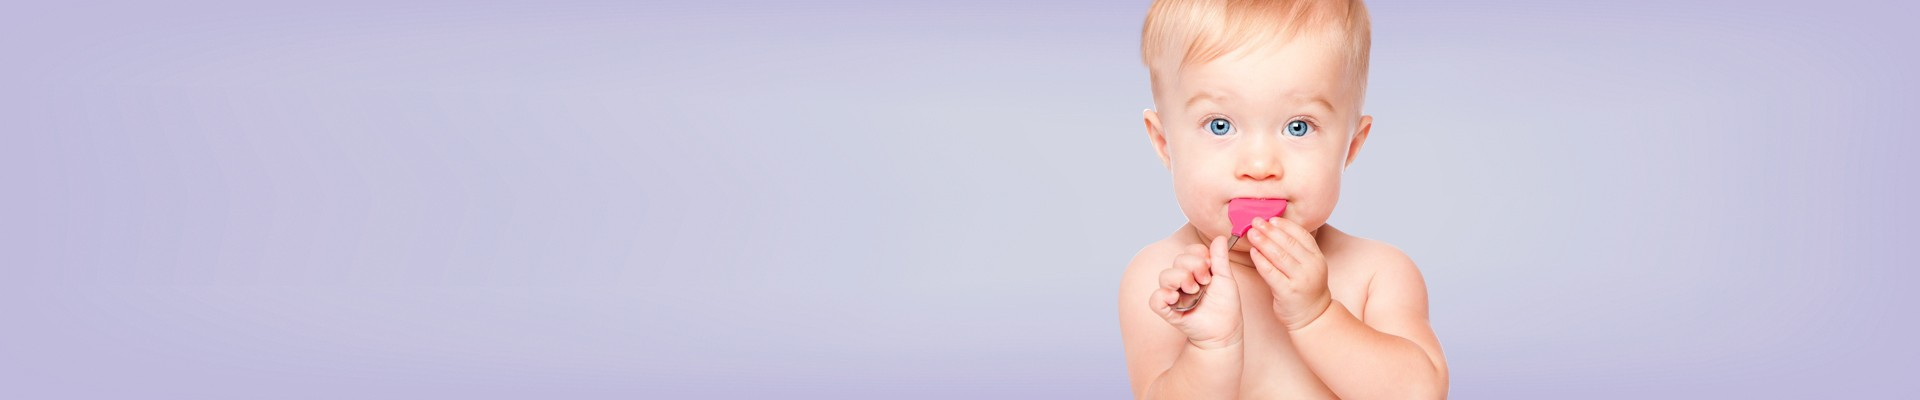 Makanan & Susu Bayi Lainnya